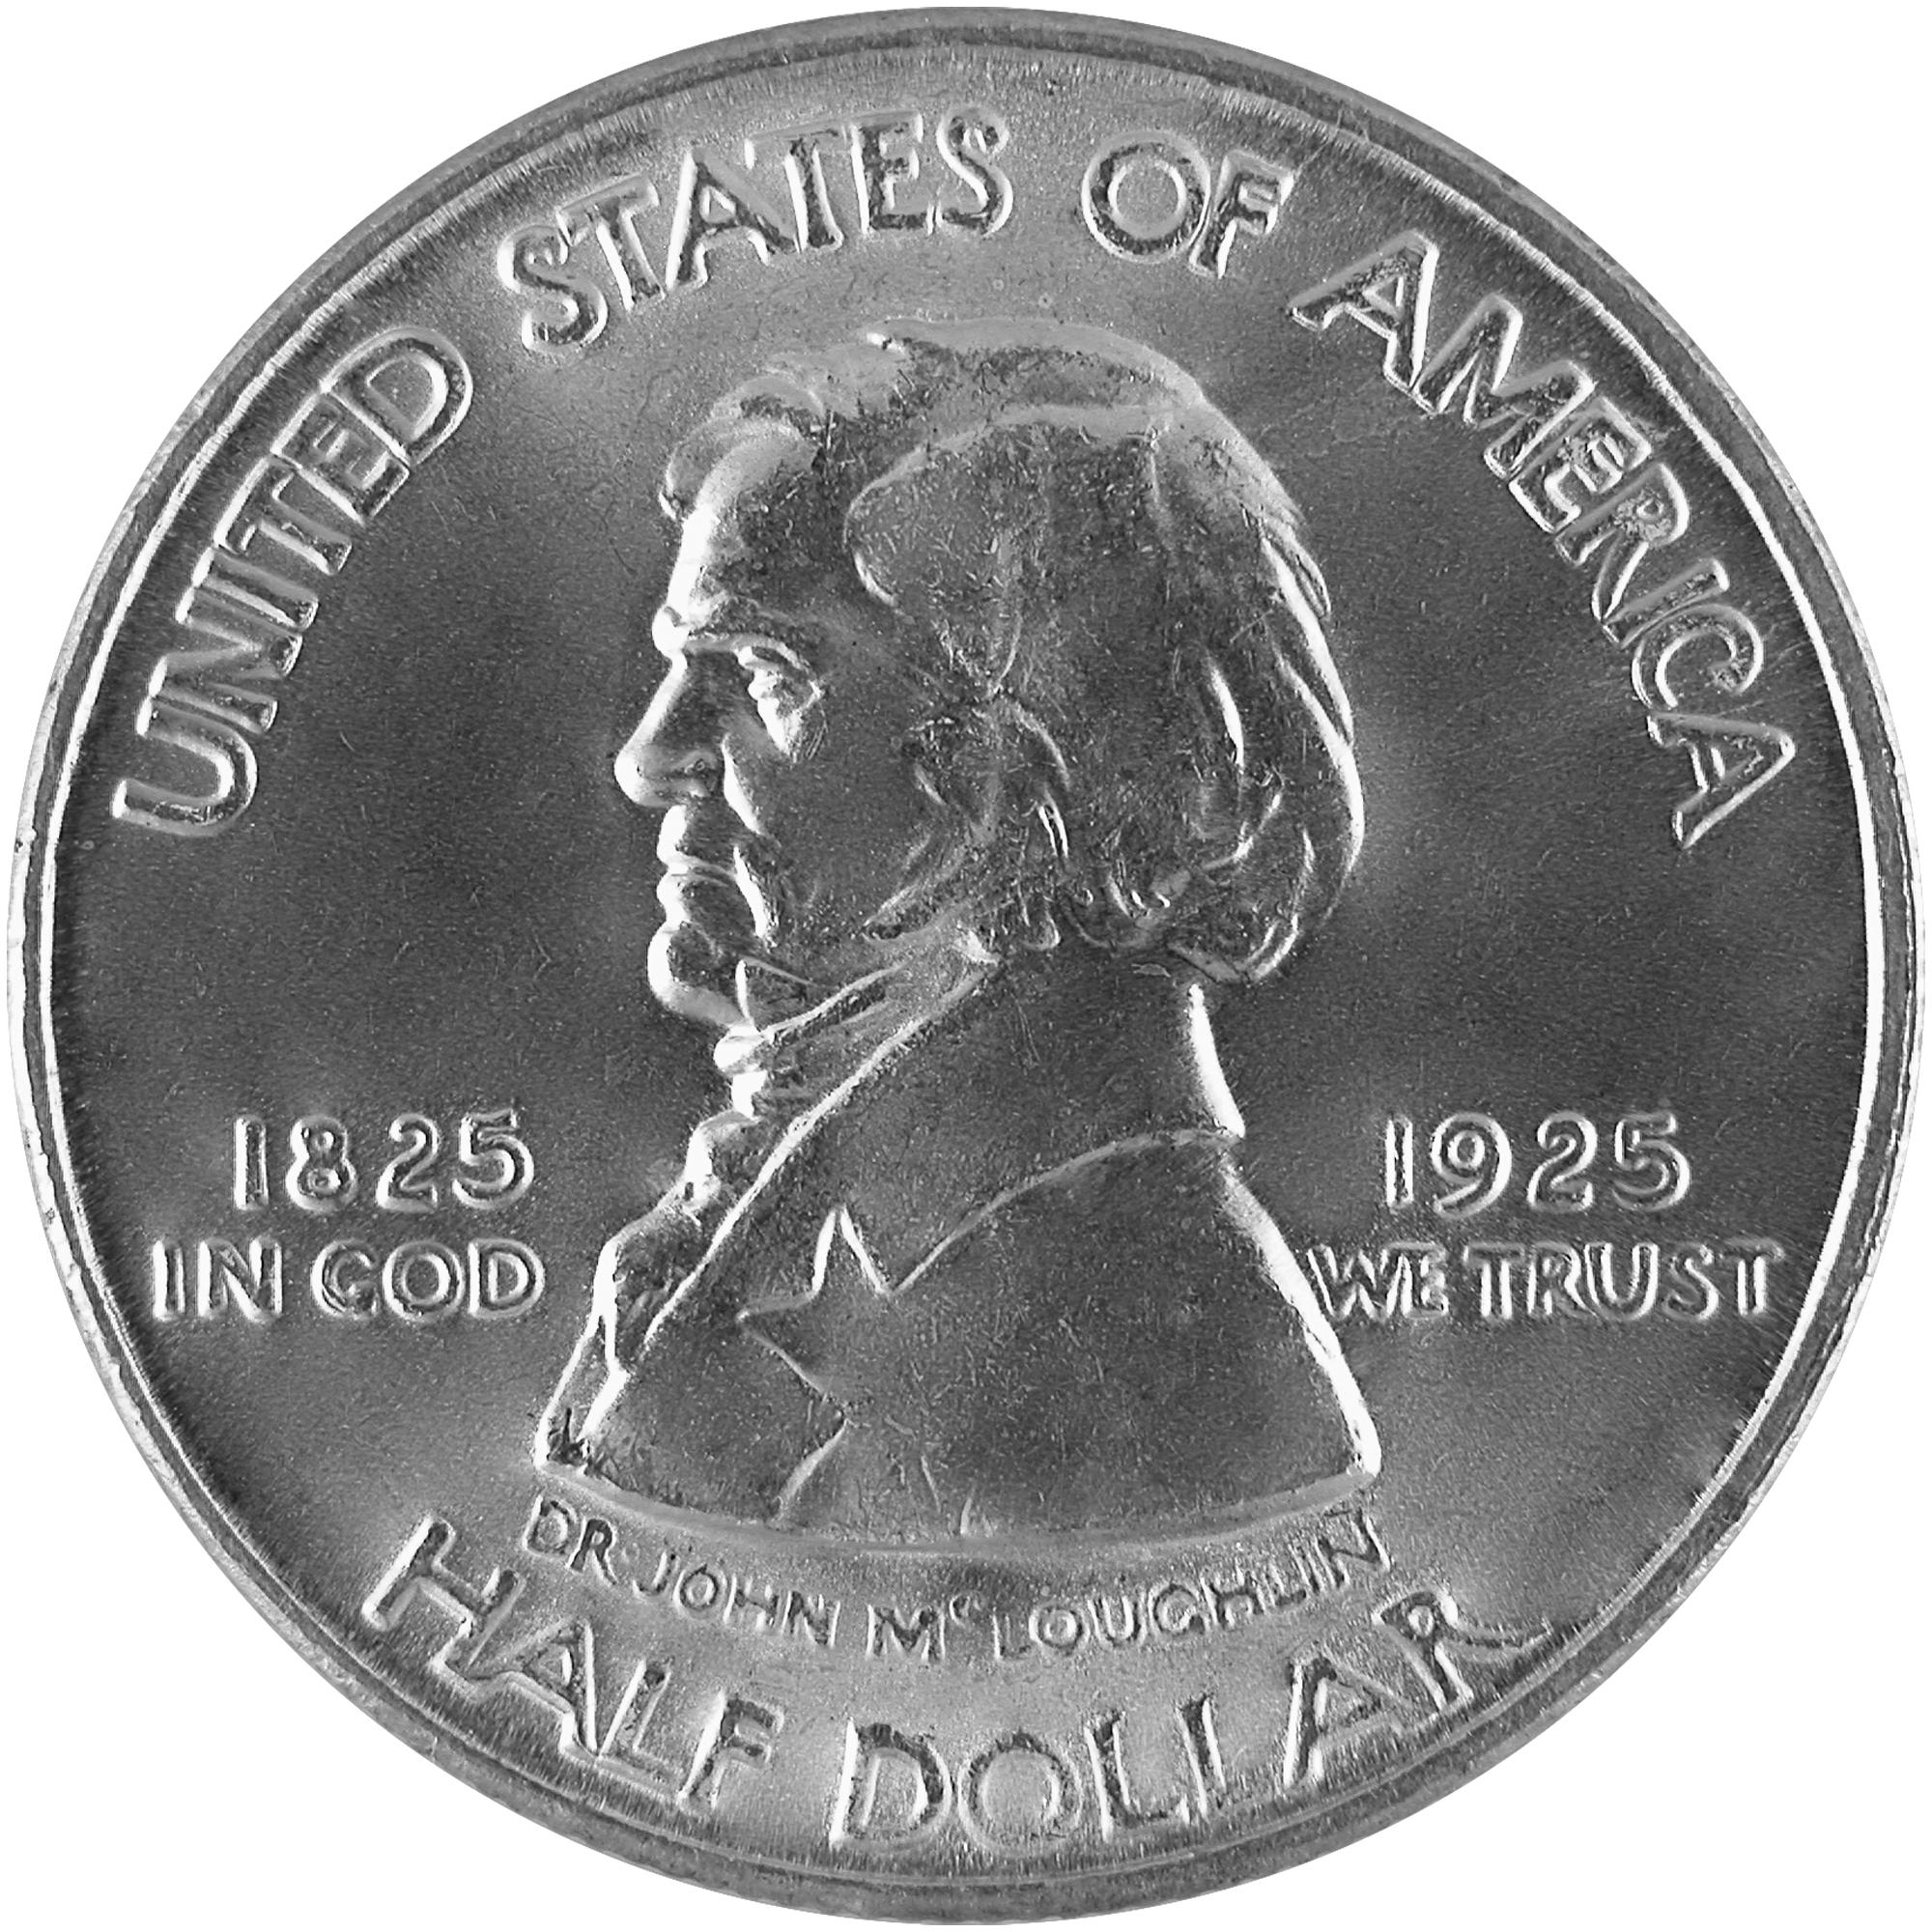 1925 Fort Vancouver Centennial Commemorative Silver Half Dollar Coin Obverse